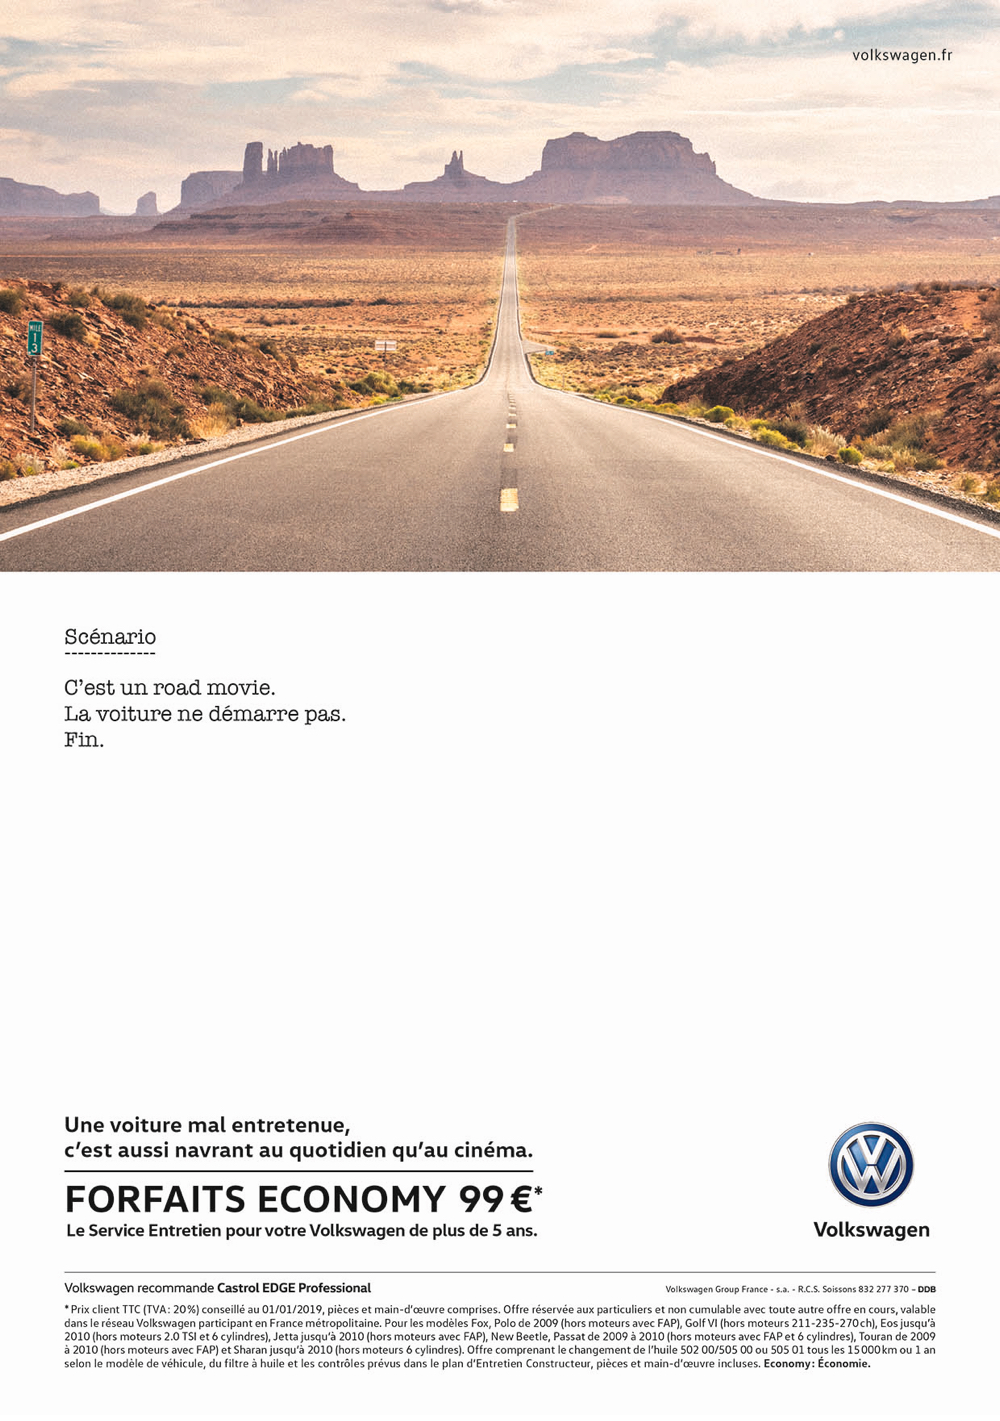 VW ENTRETIEN AUTO img3